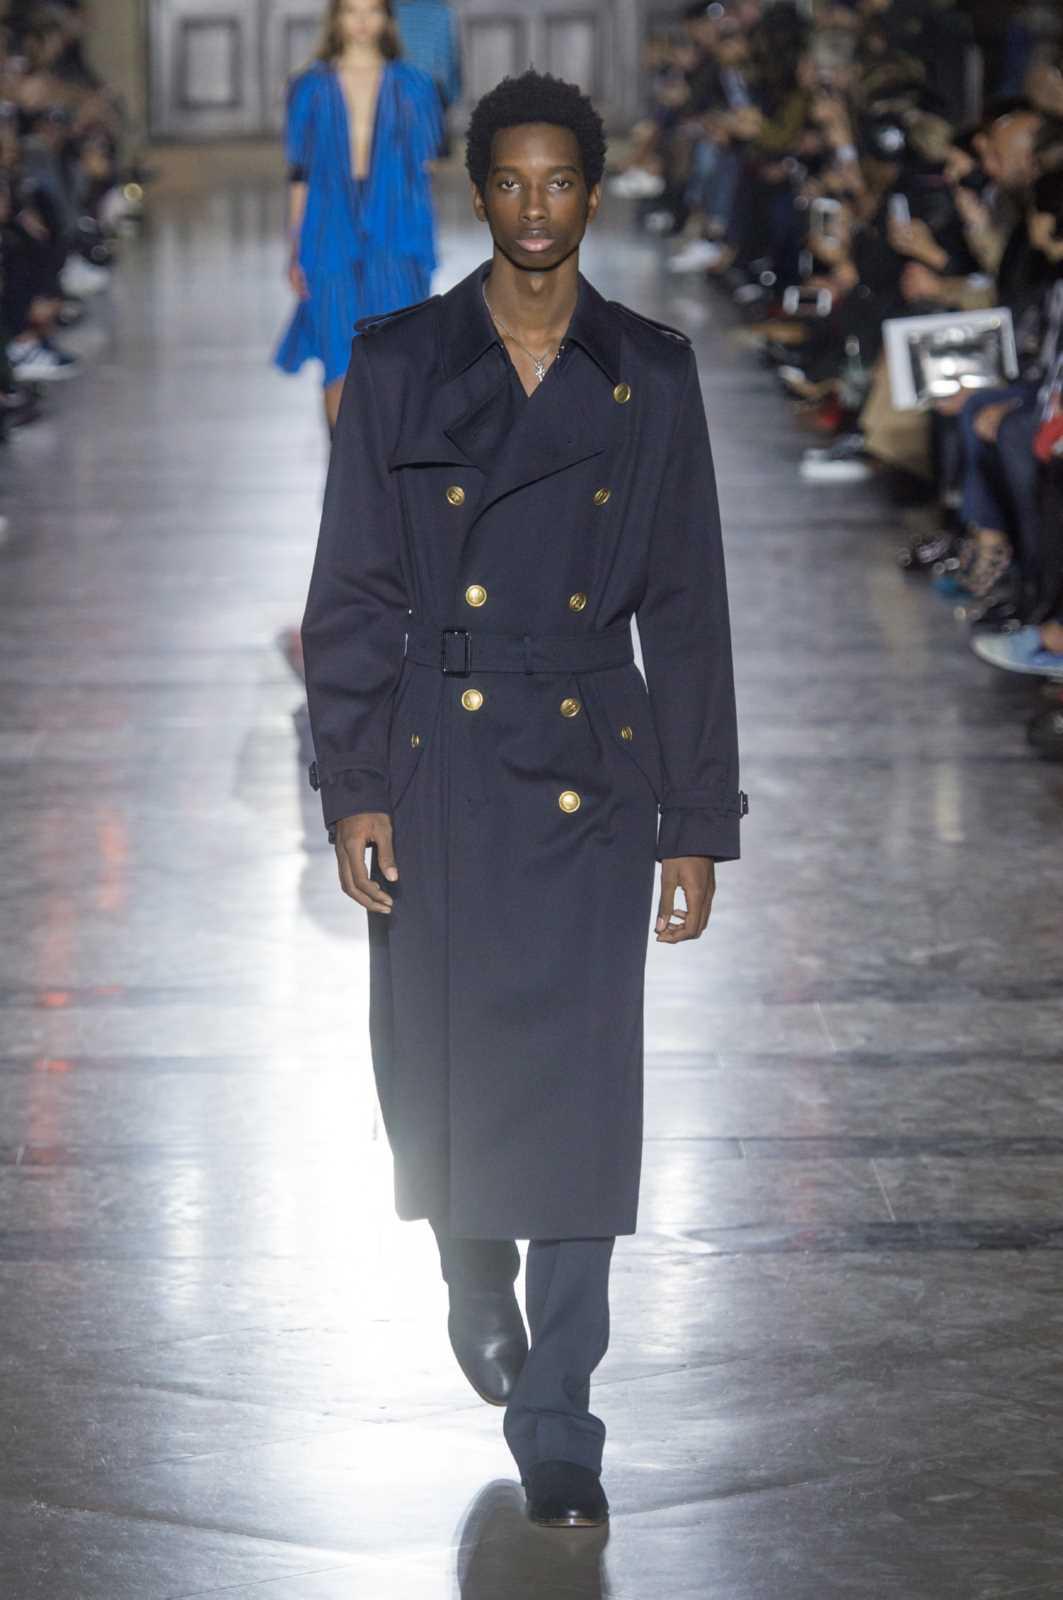 Givenchy Spring Summer 2018 Paris Fashion Week Male